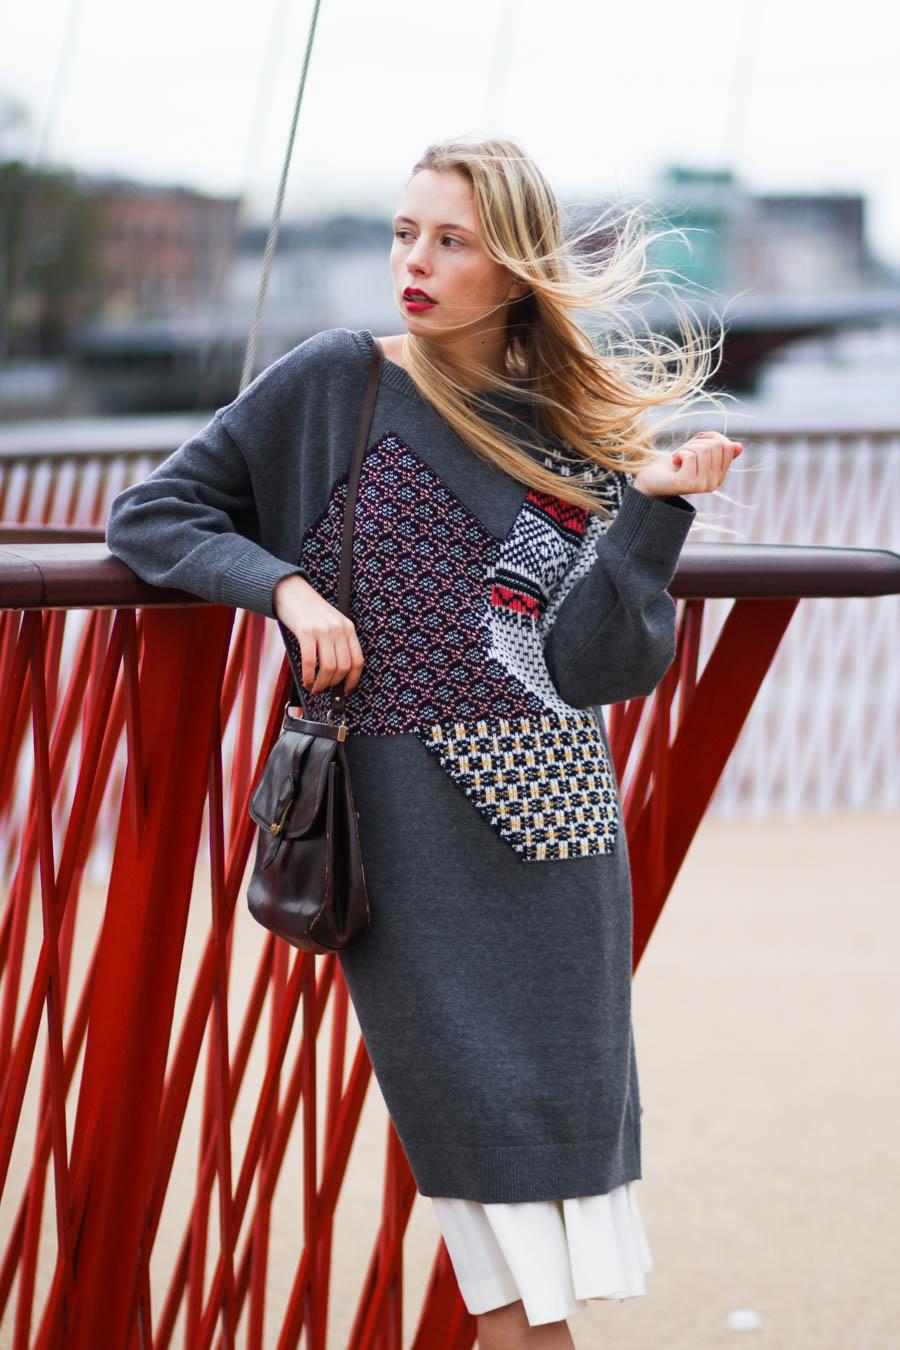 outfit November nemesis babe marie jensen danish blogger -7-2